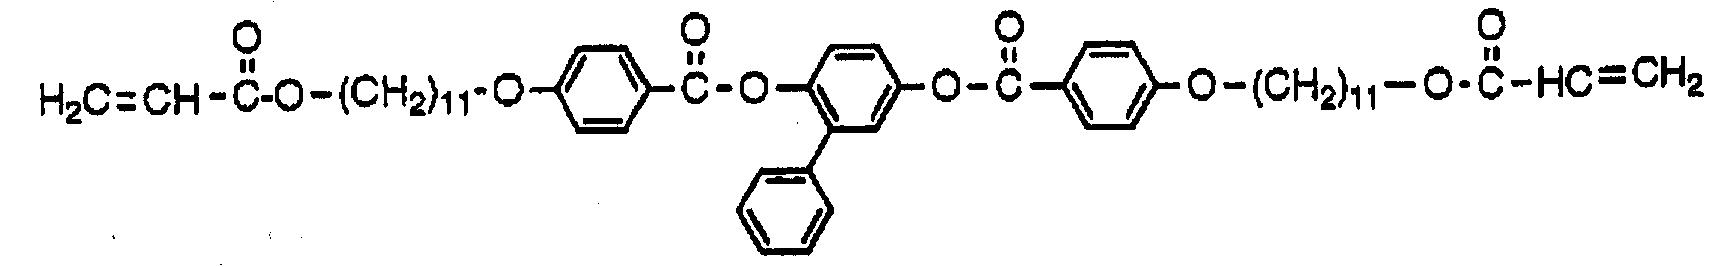 Figure 112003021761633-pct00006